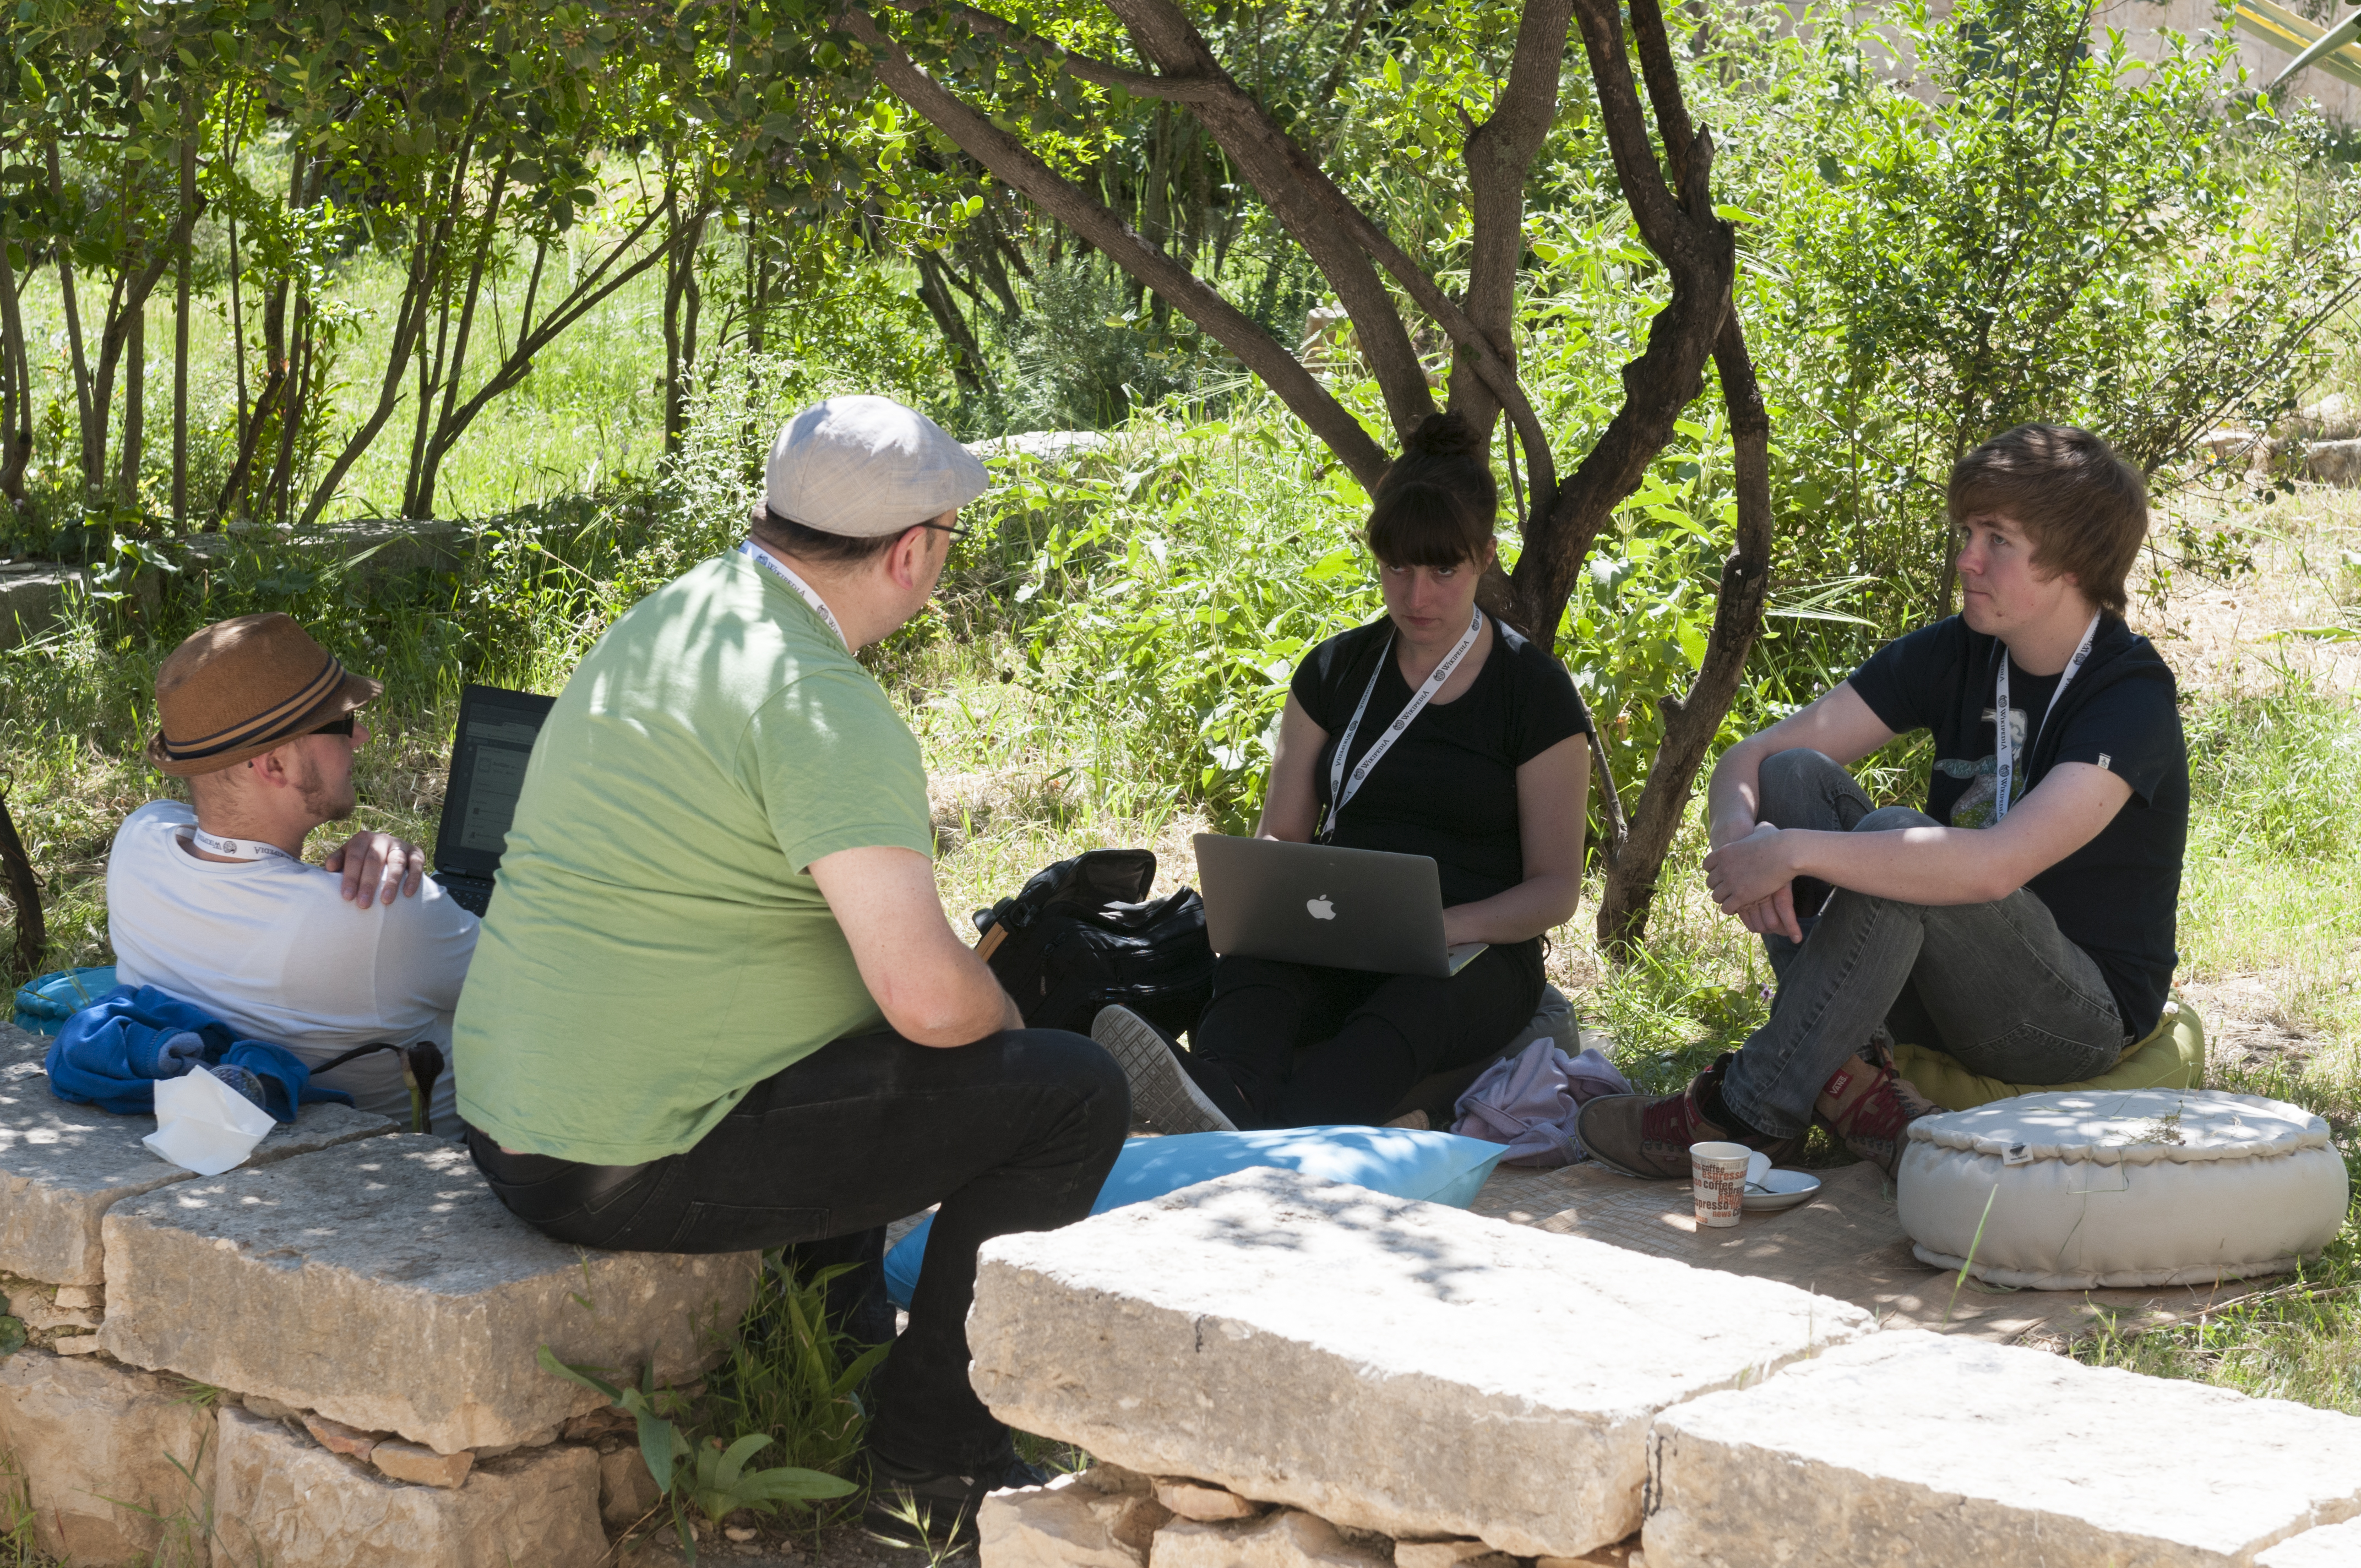 16-04-01-Hackathon-Jerusalem-Hanse-House-WAT 5842.jpg